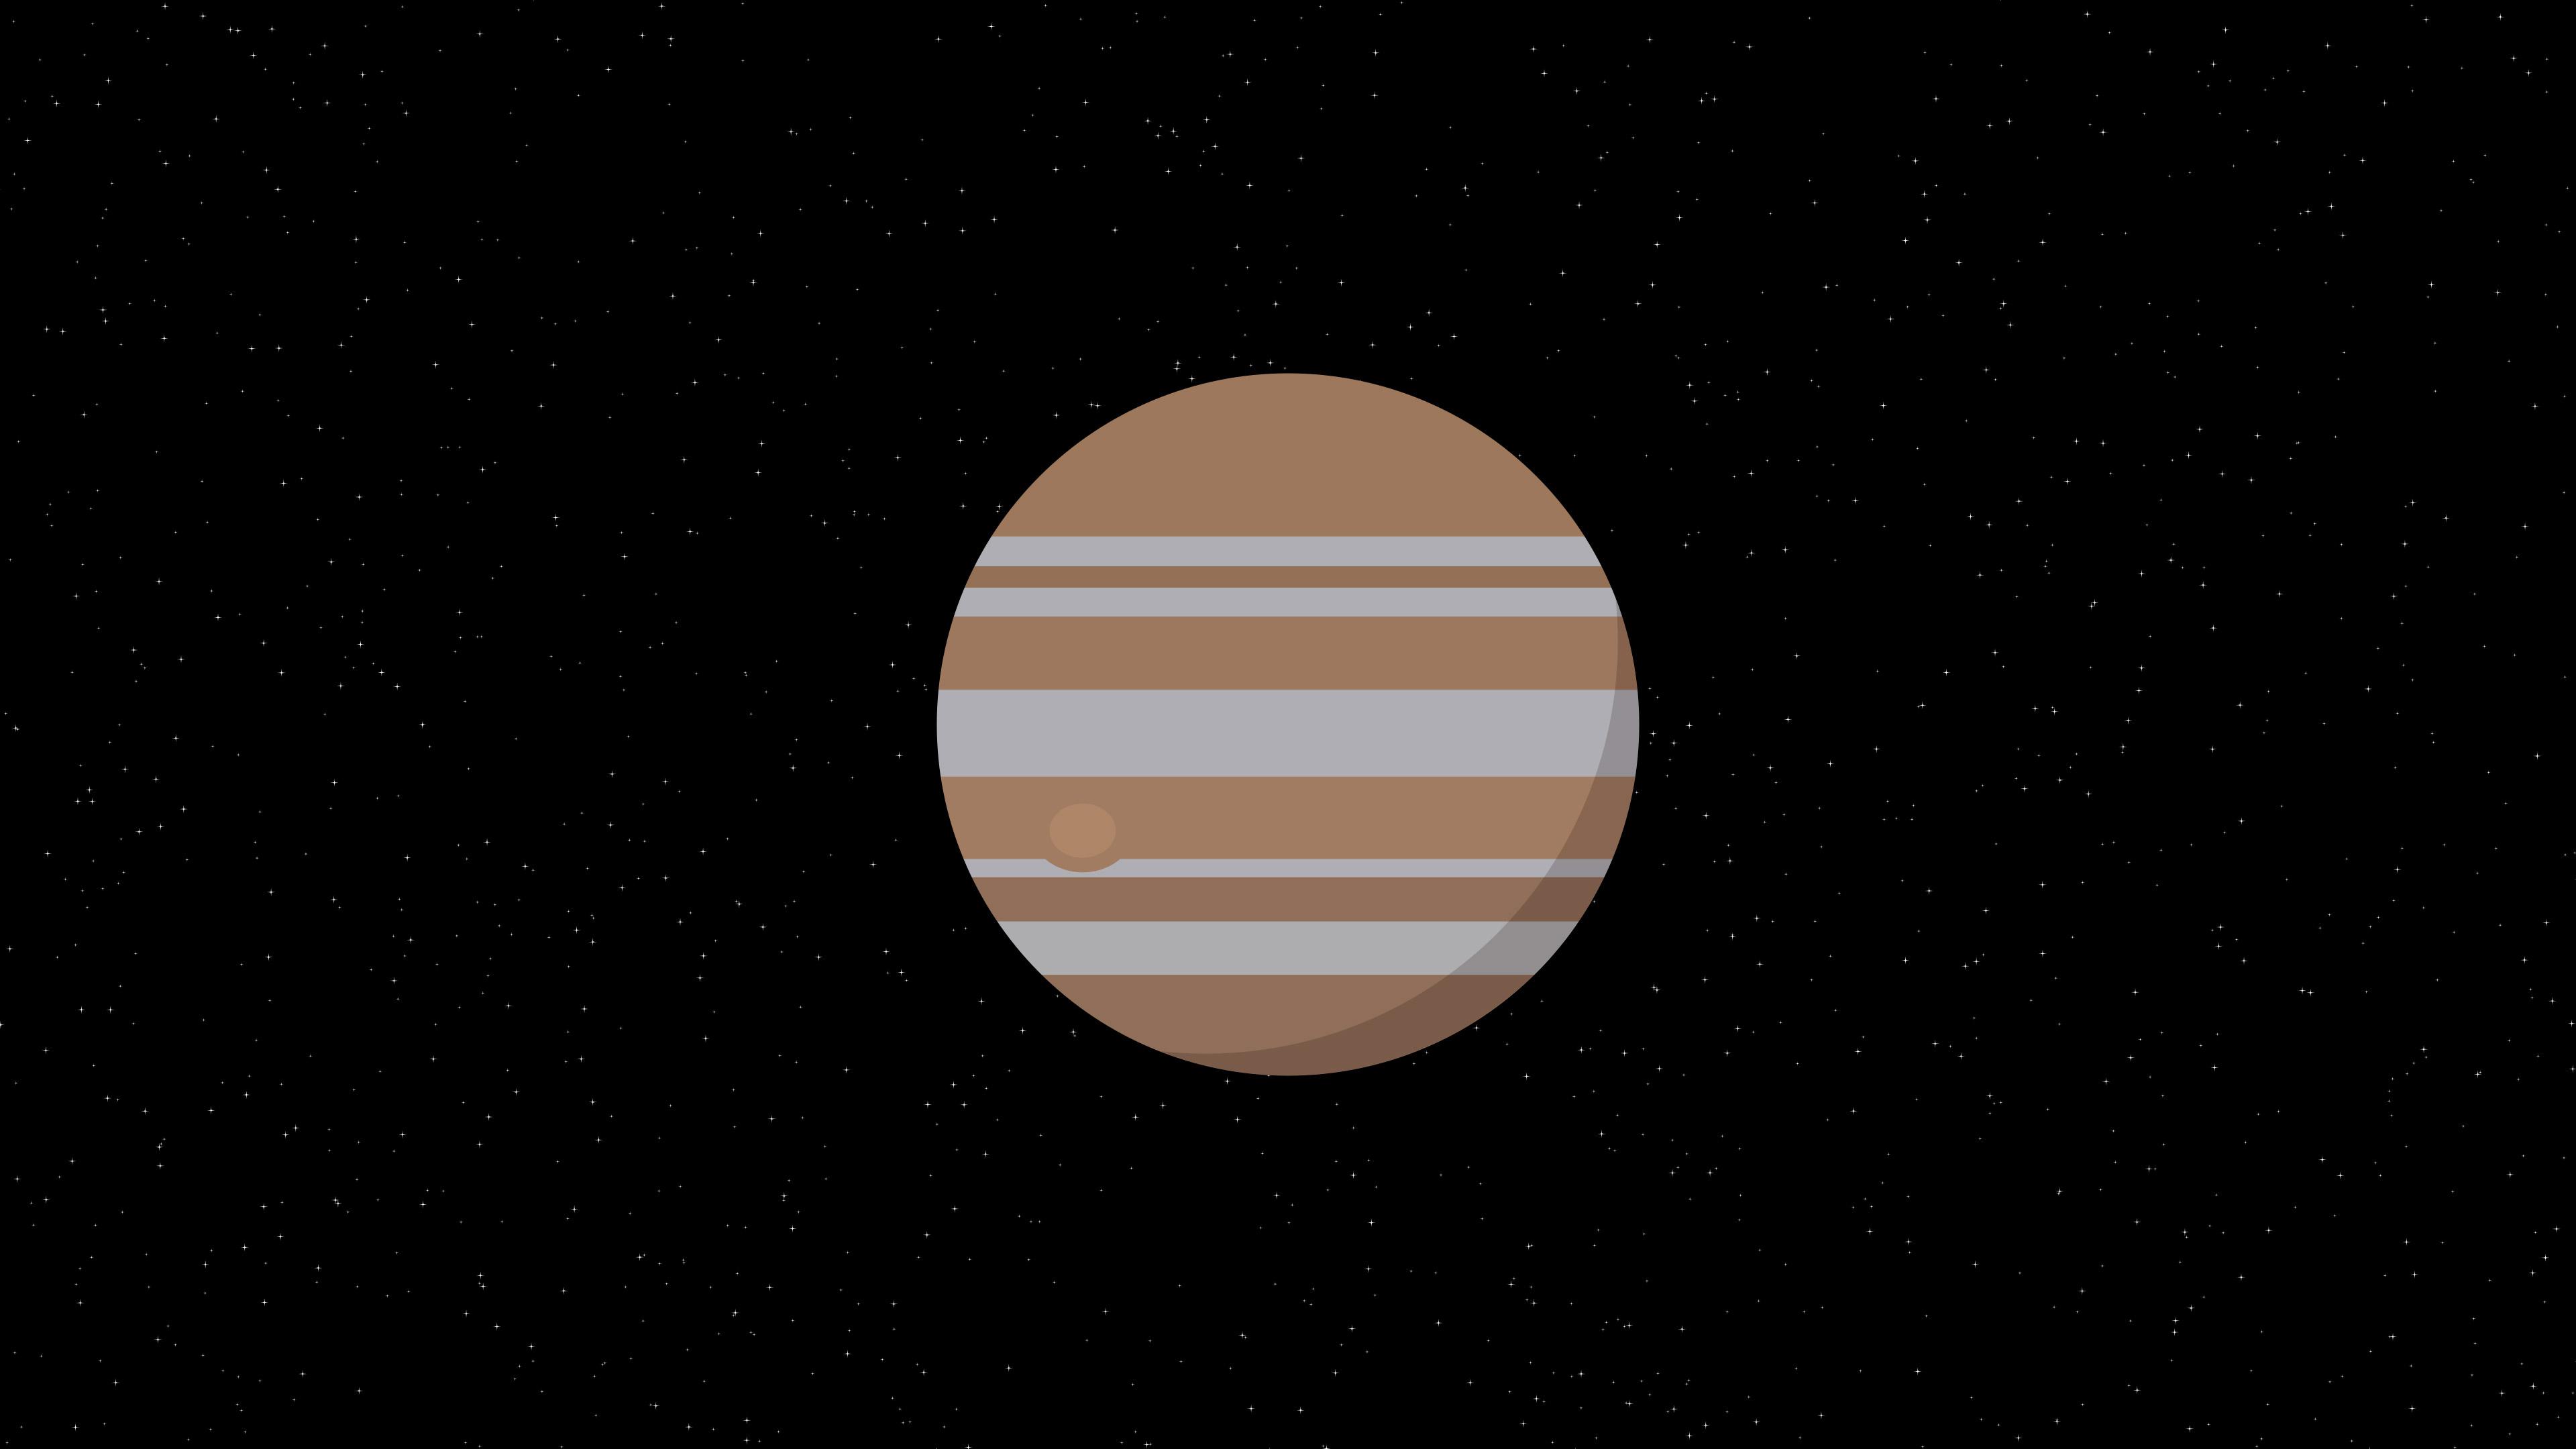 Jupiter Planet Minimalism 4k Hd Artist 4k Wallpapers